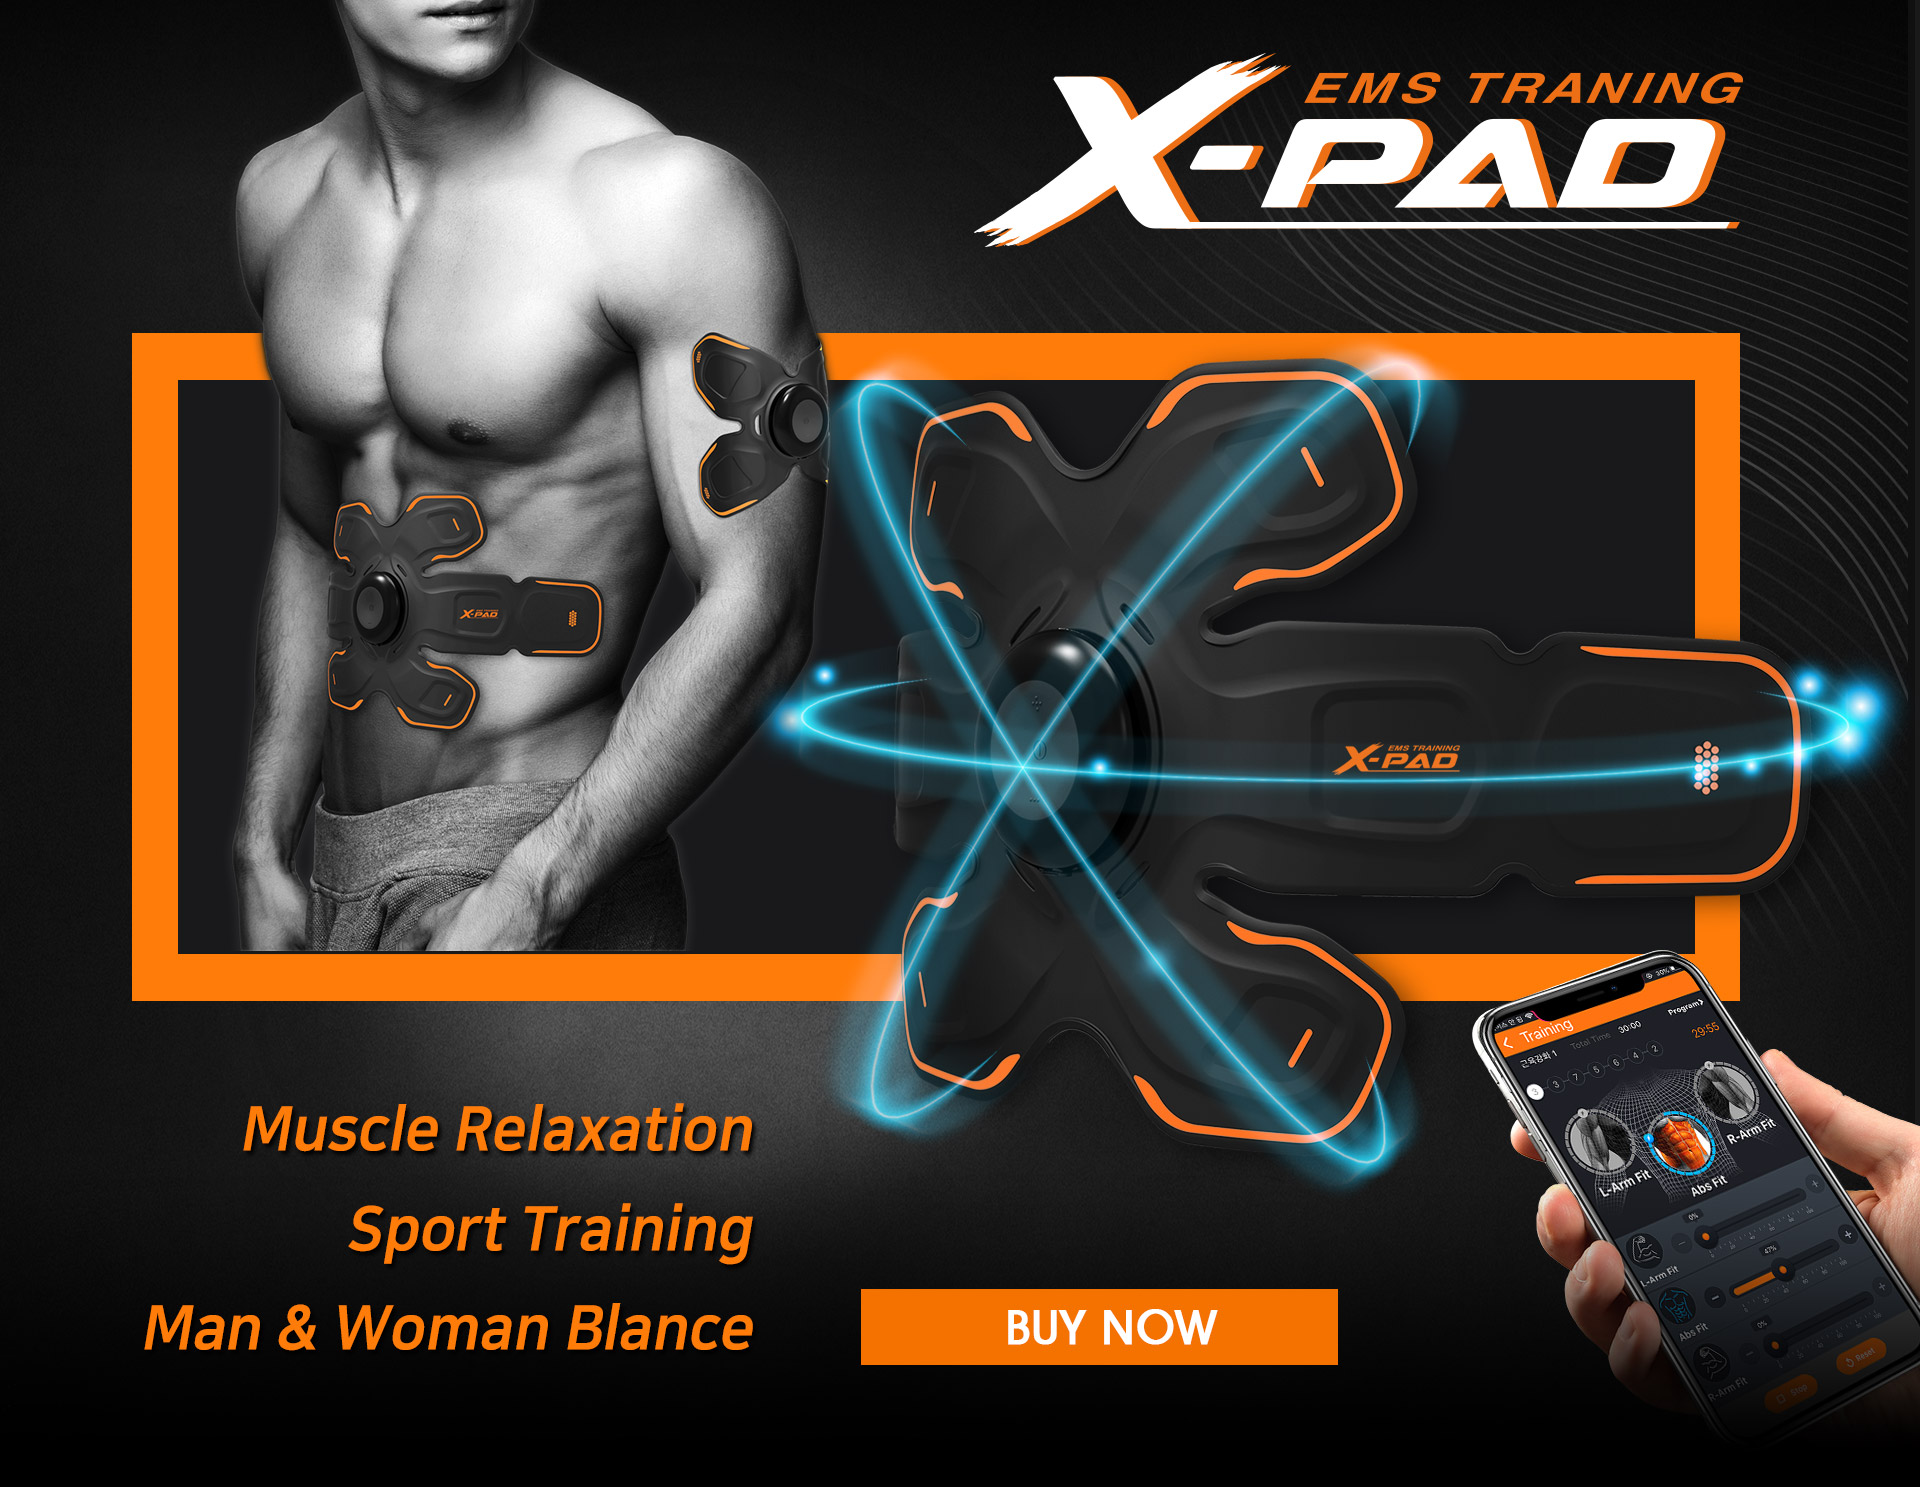 X-PAD EMS 트레이닝